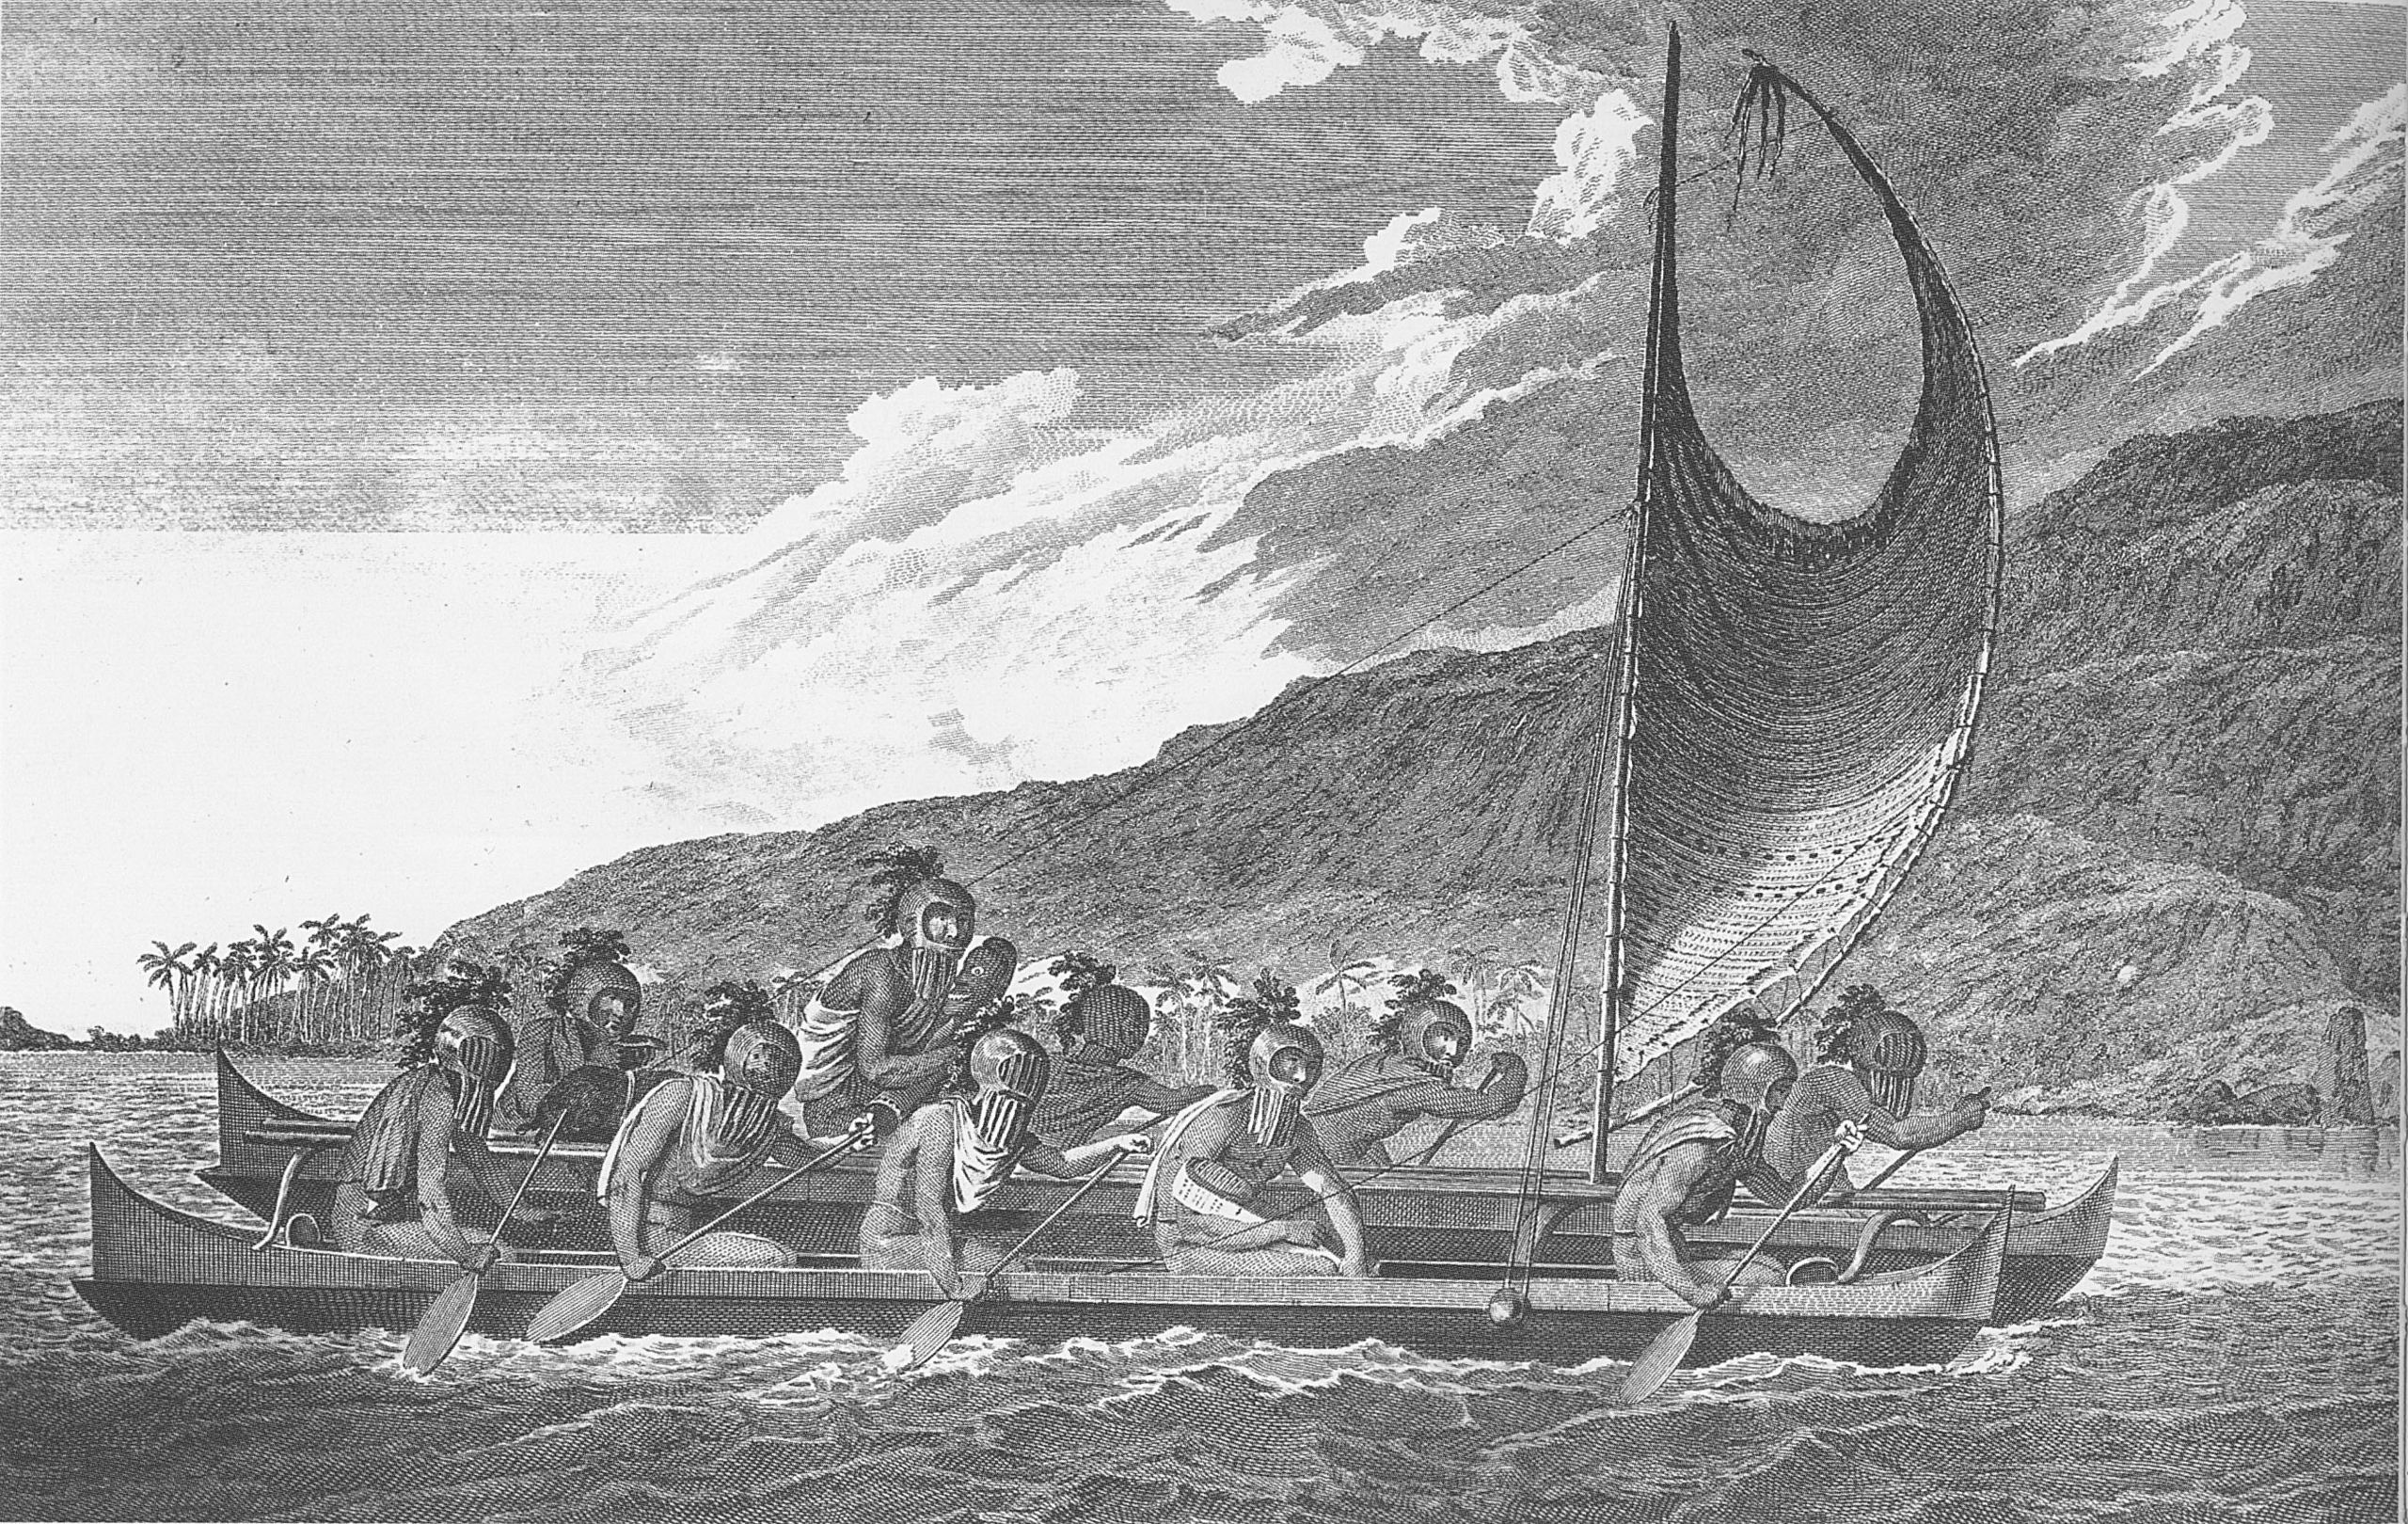 Old photo of Polynesian voyaging